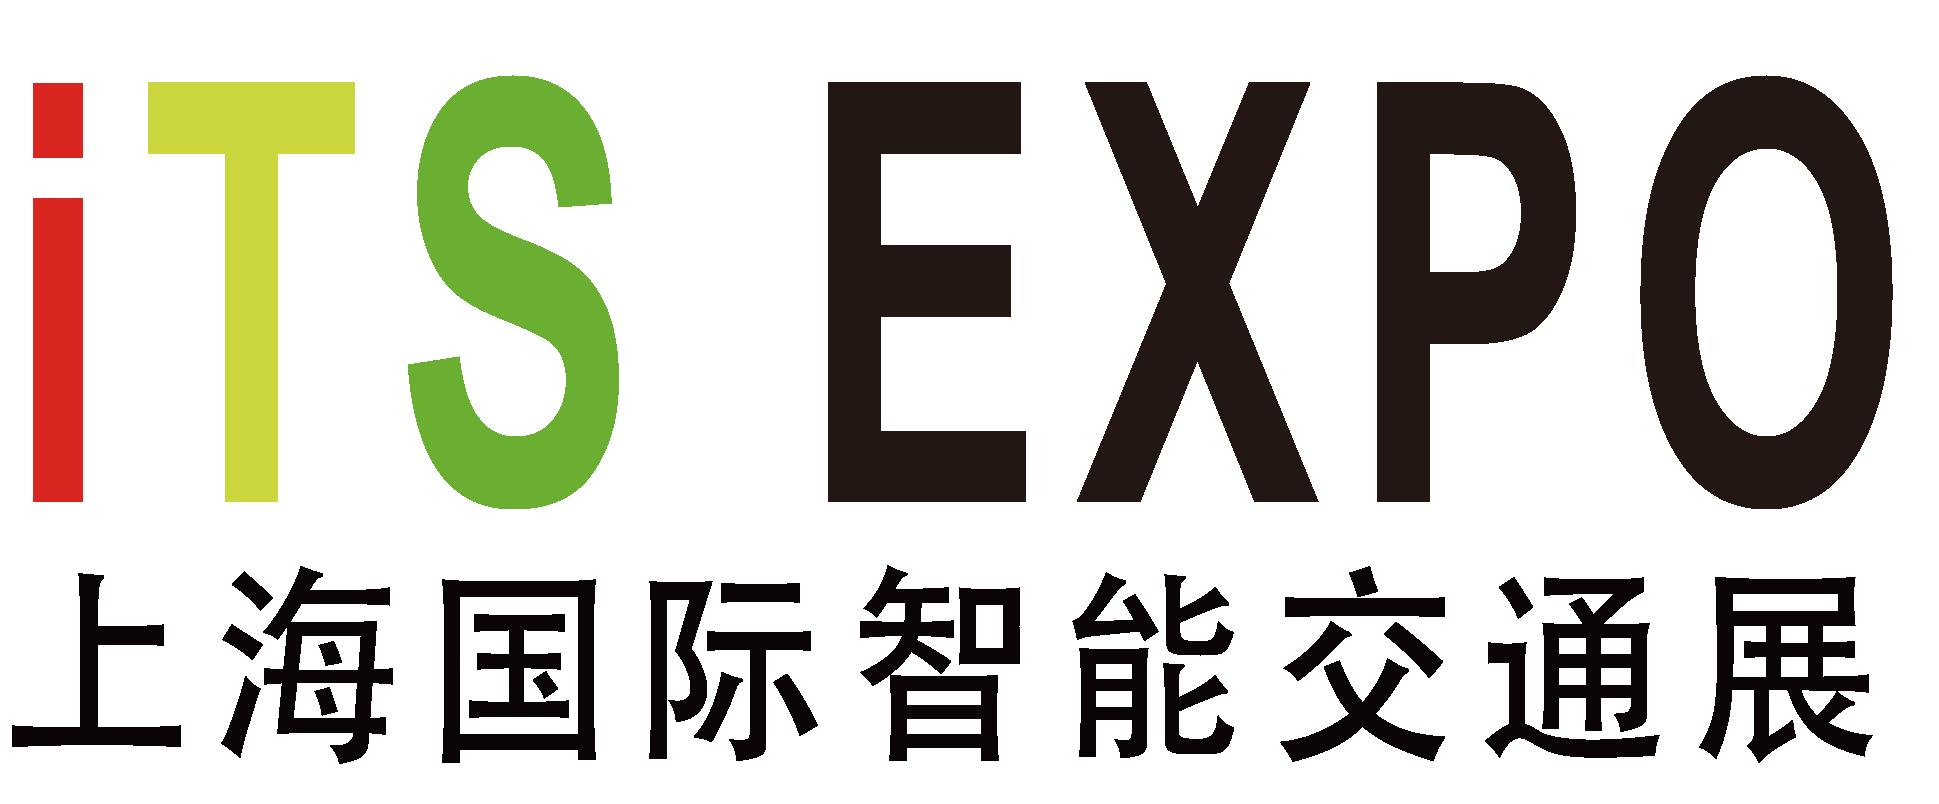 ITSE 2018上海国际智能交通展览会